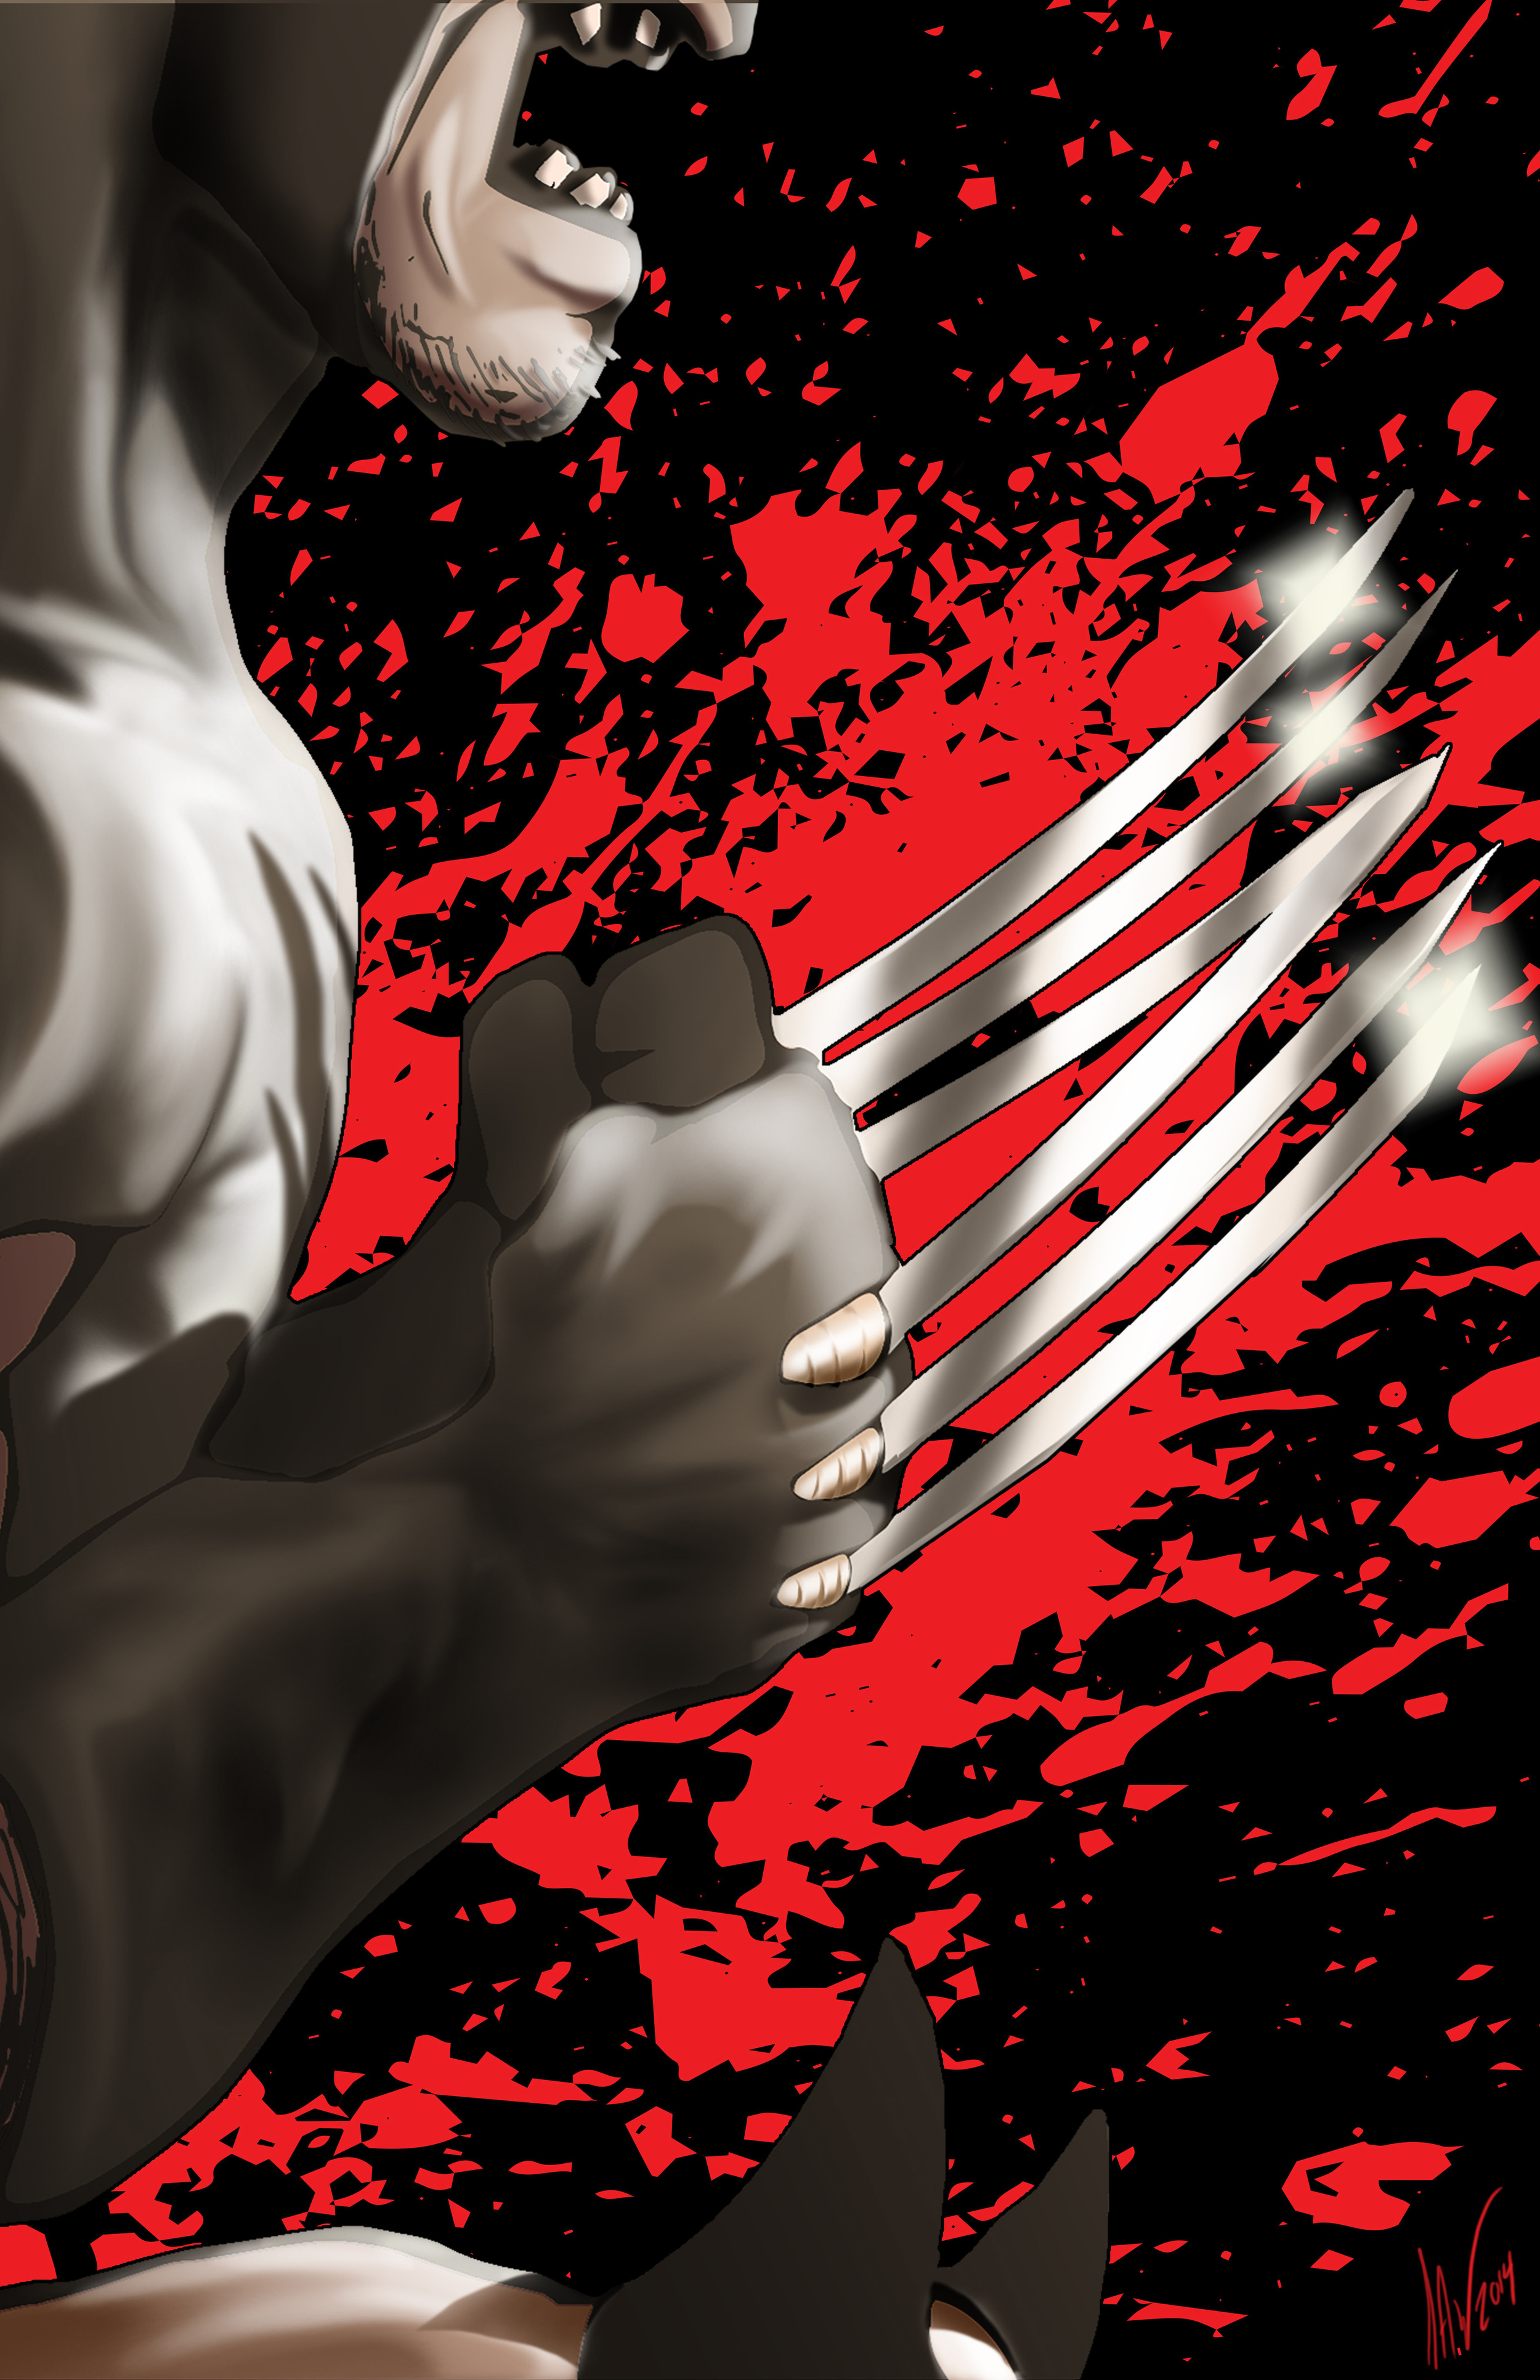 Wolverine-Berzerker Rage 11x17.jpg